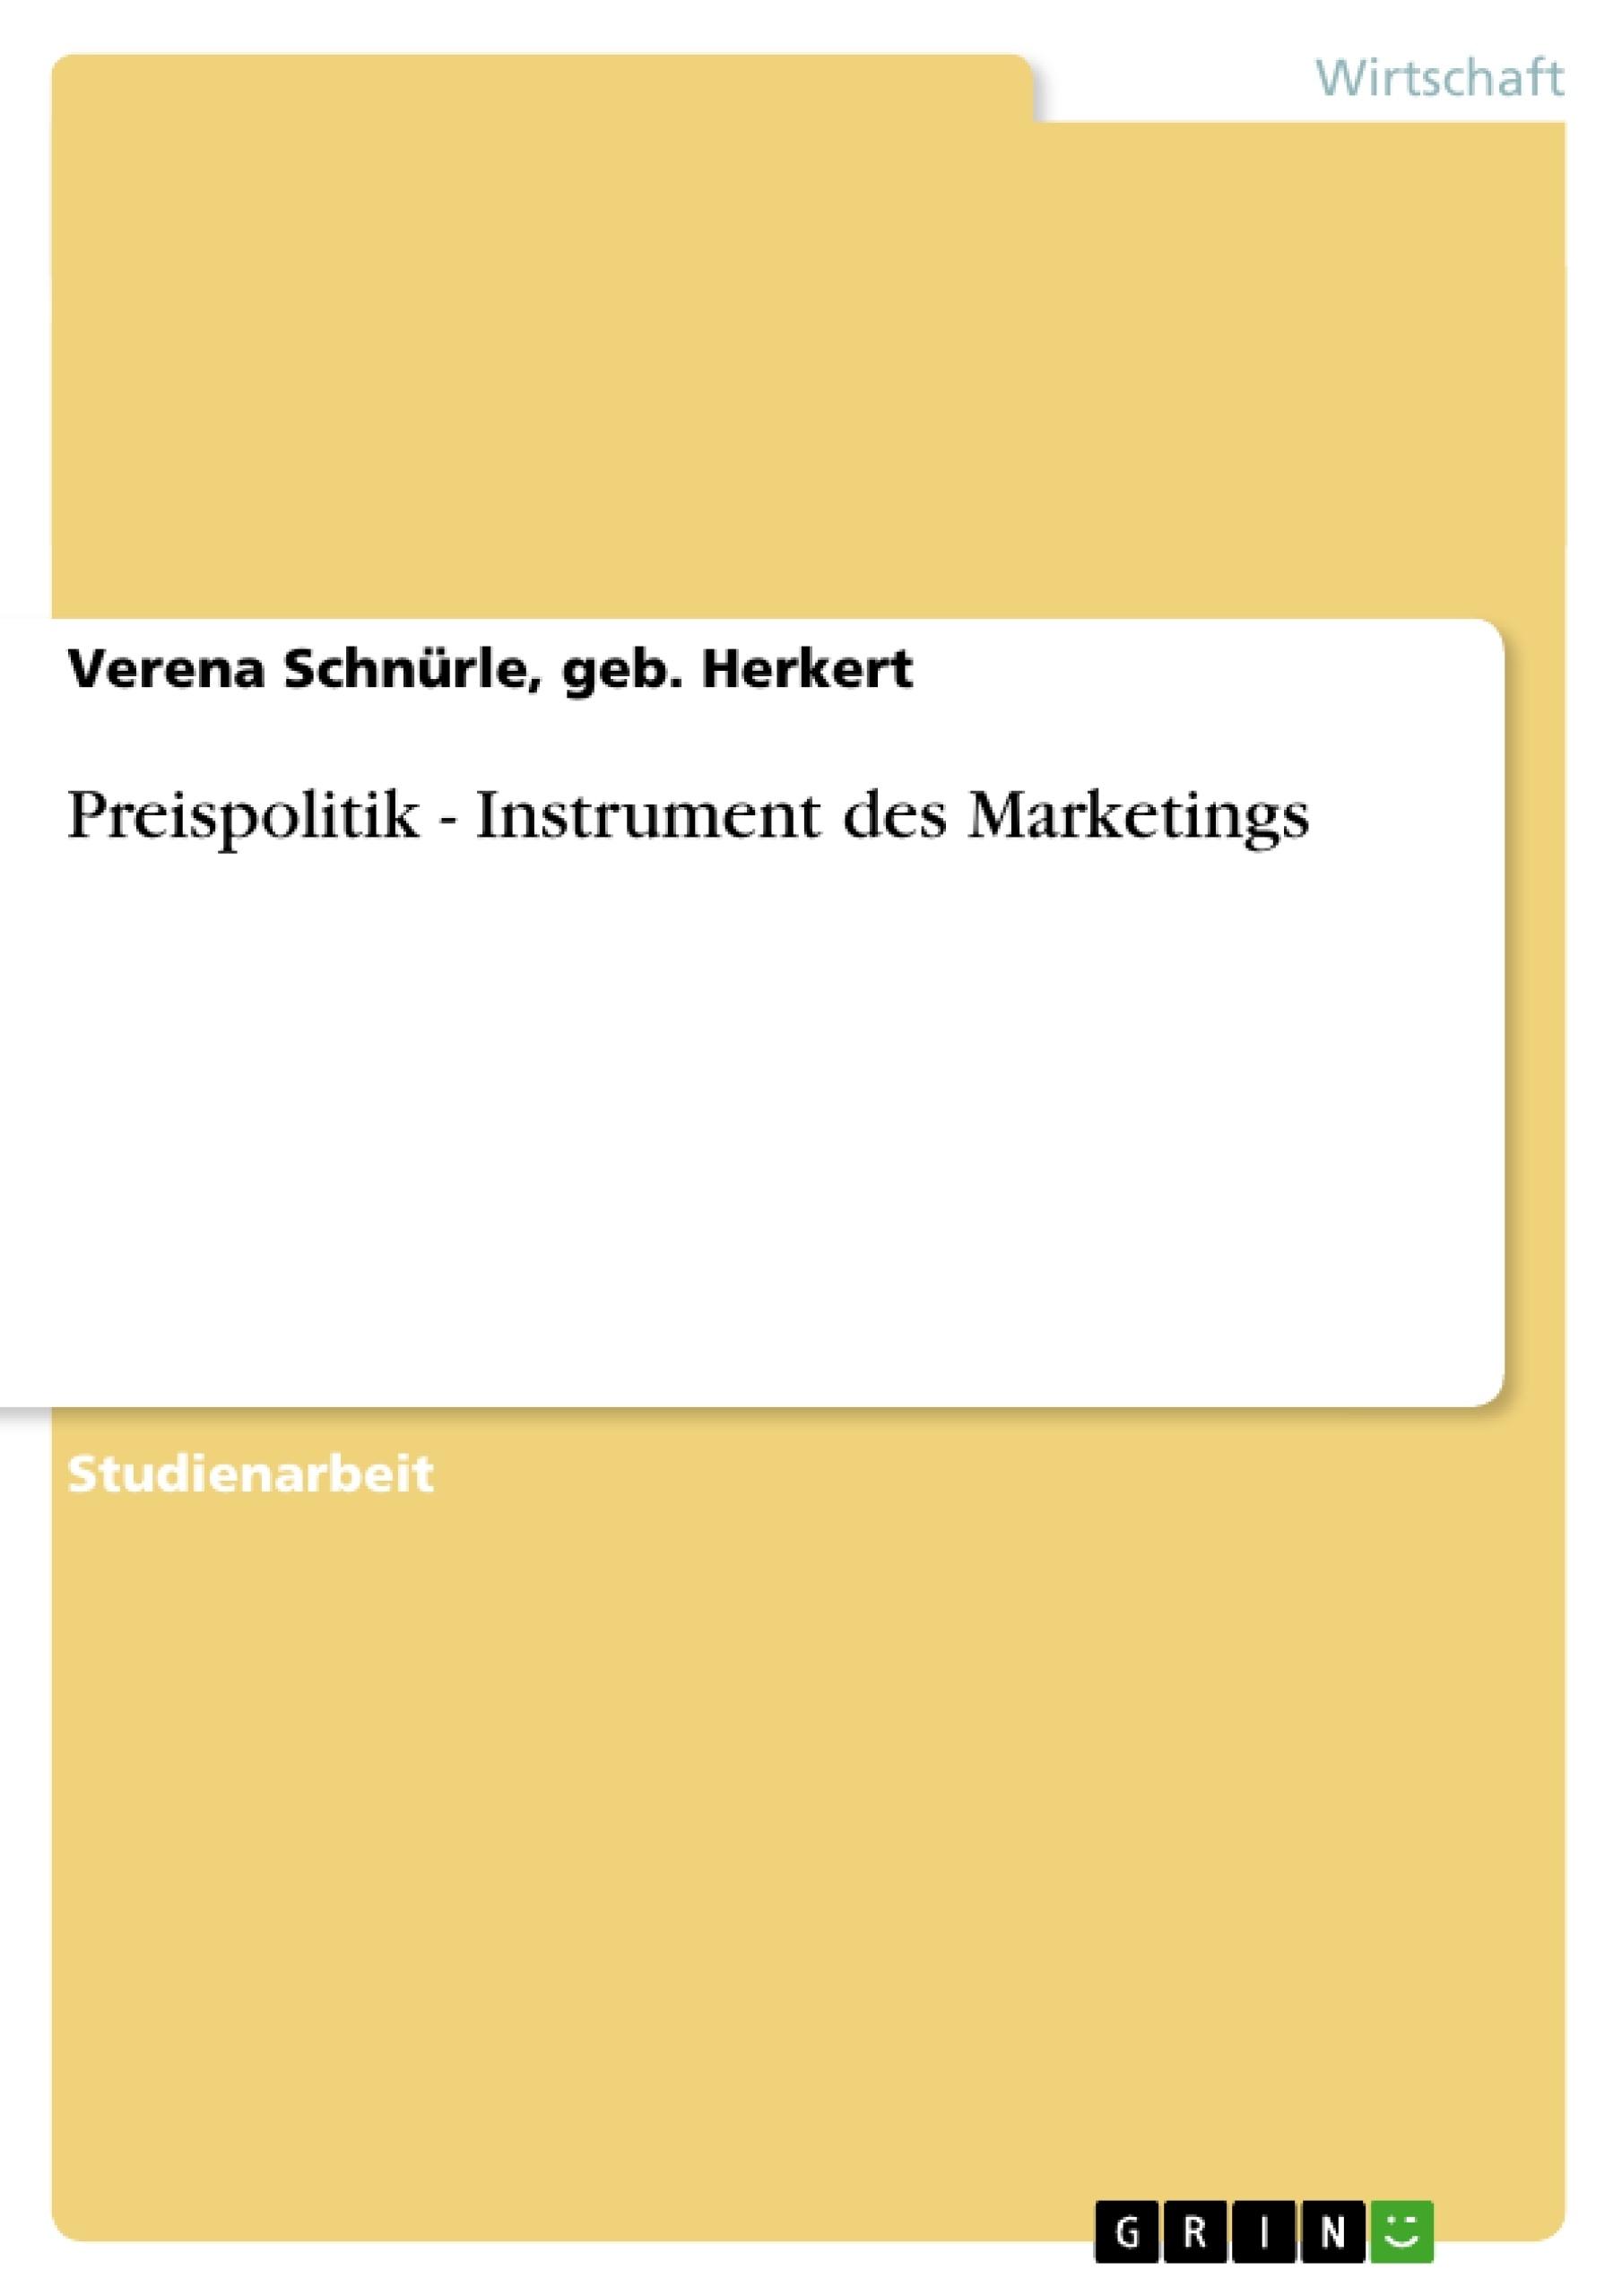 Titel: Preispolitik - Instrument des Marketings